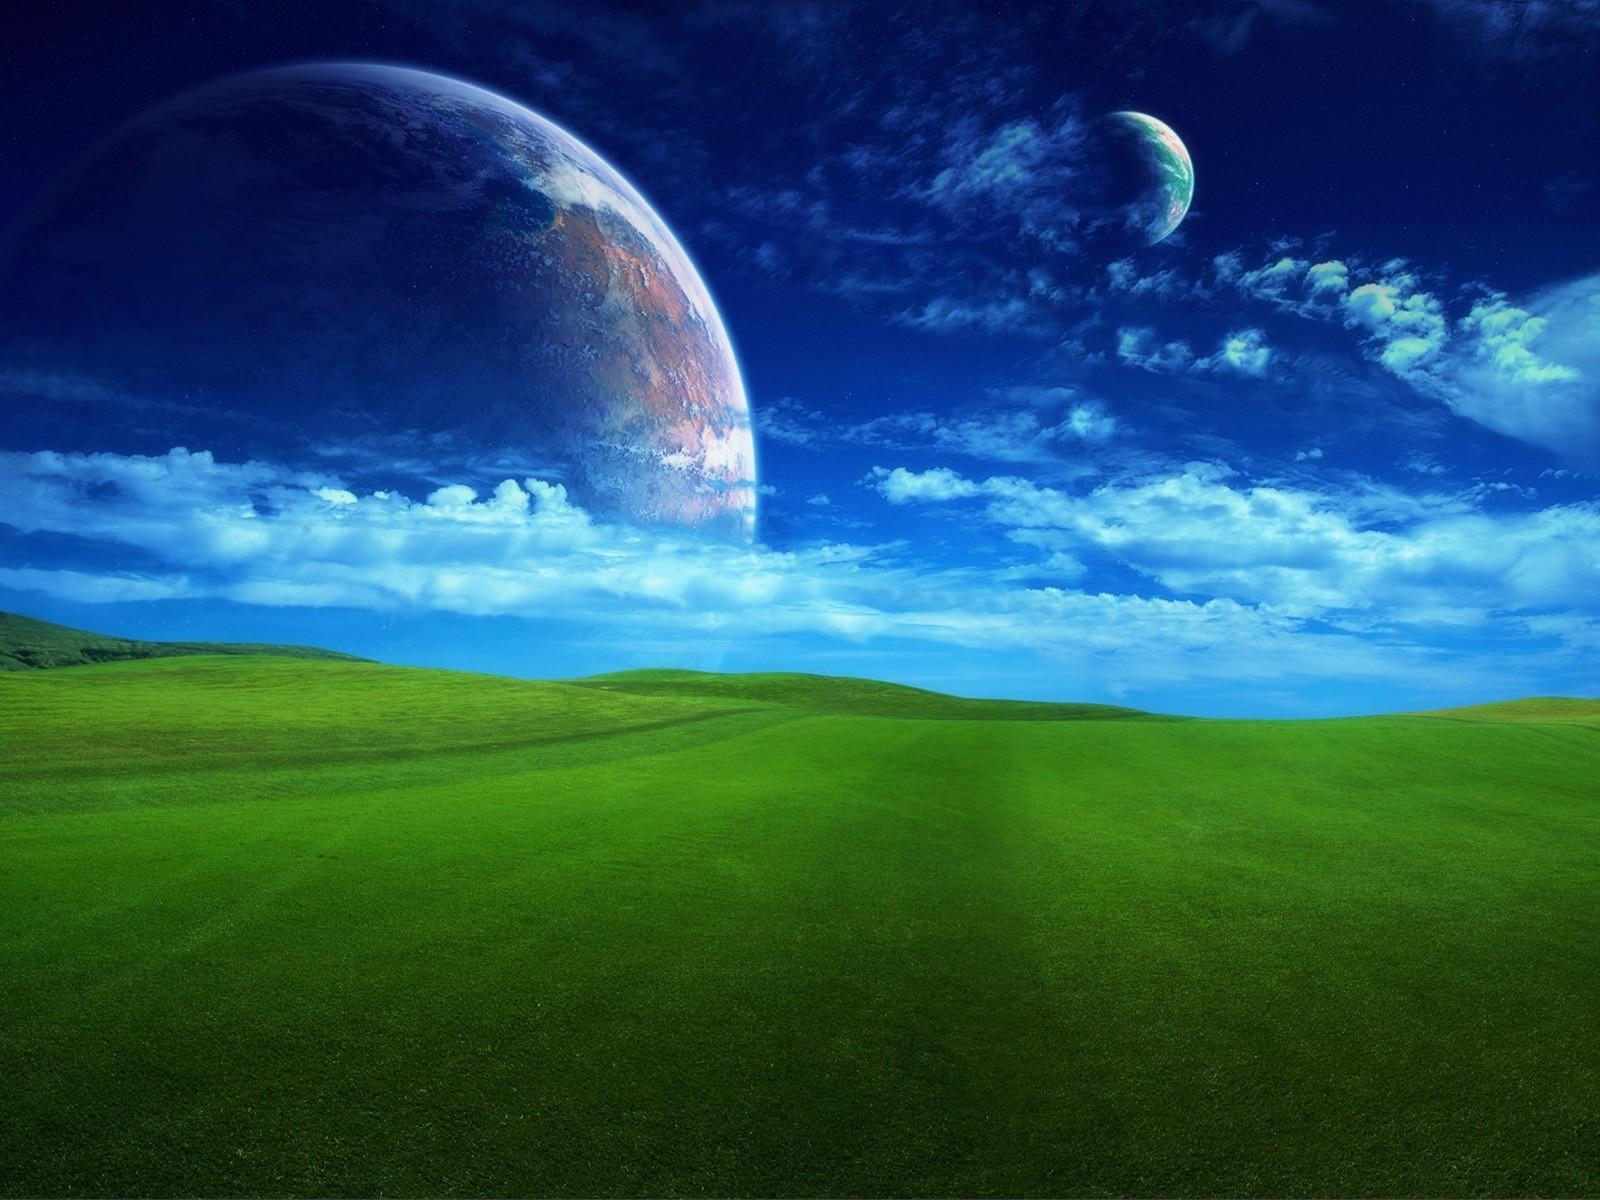 Download wallpaper windows moon wallpaper download photo moon 1600x1200